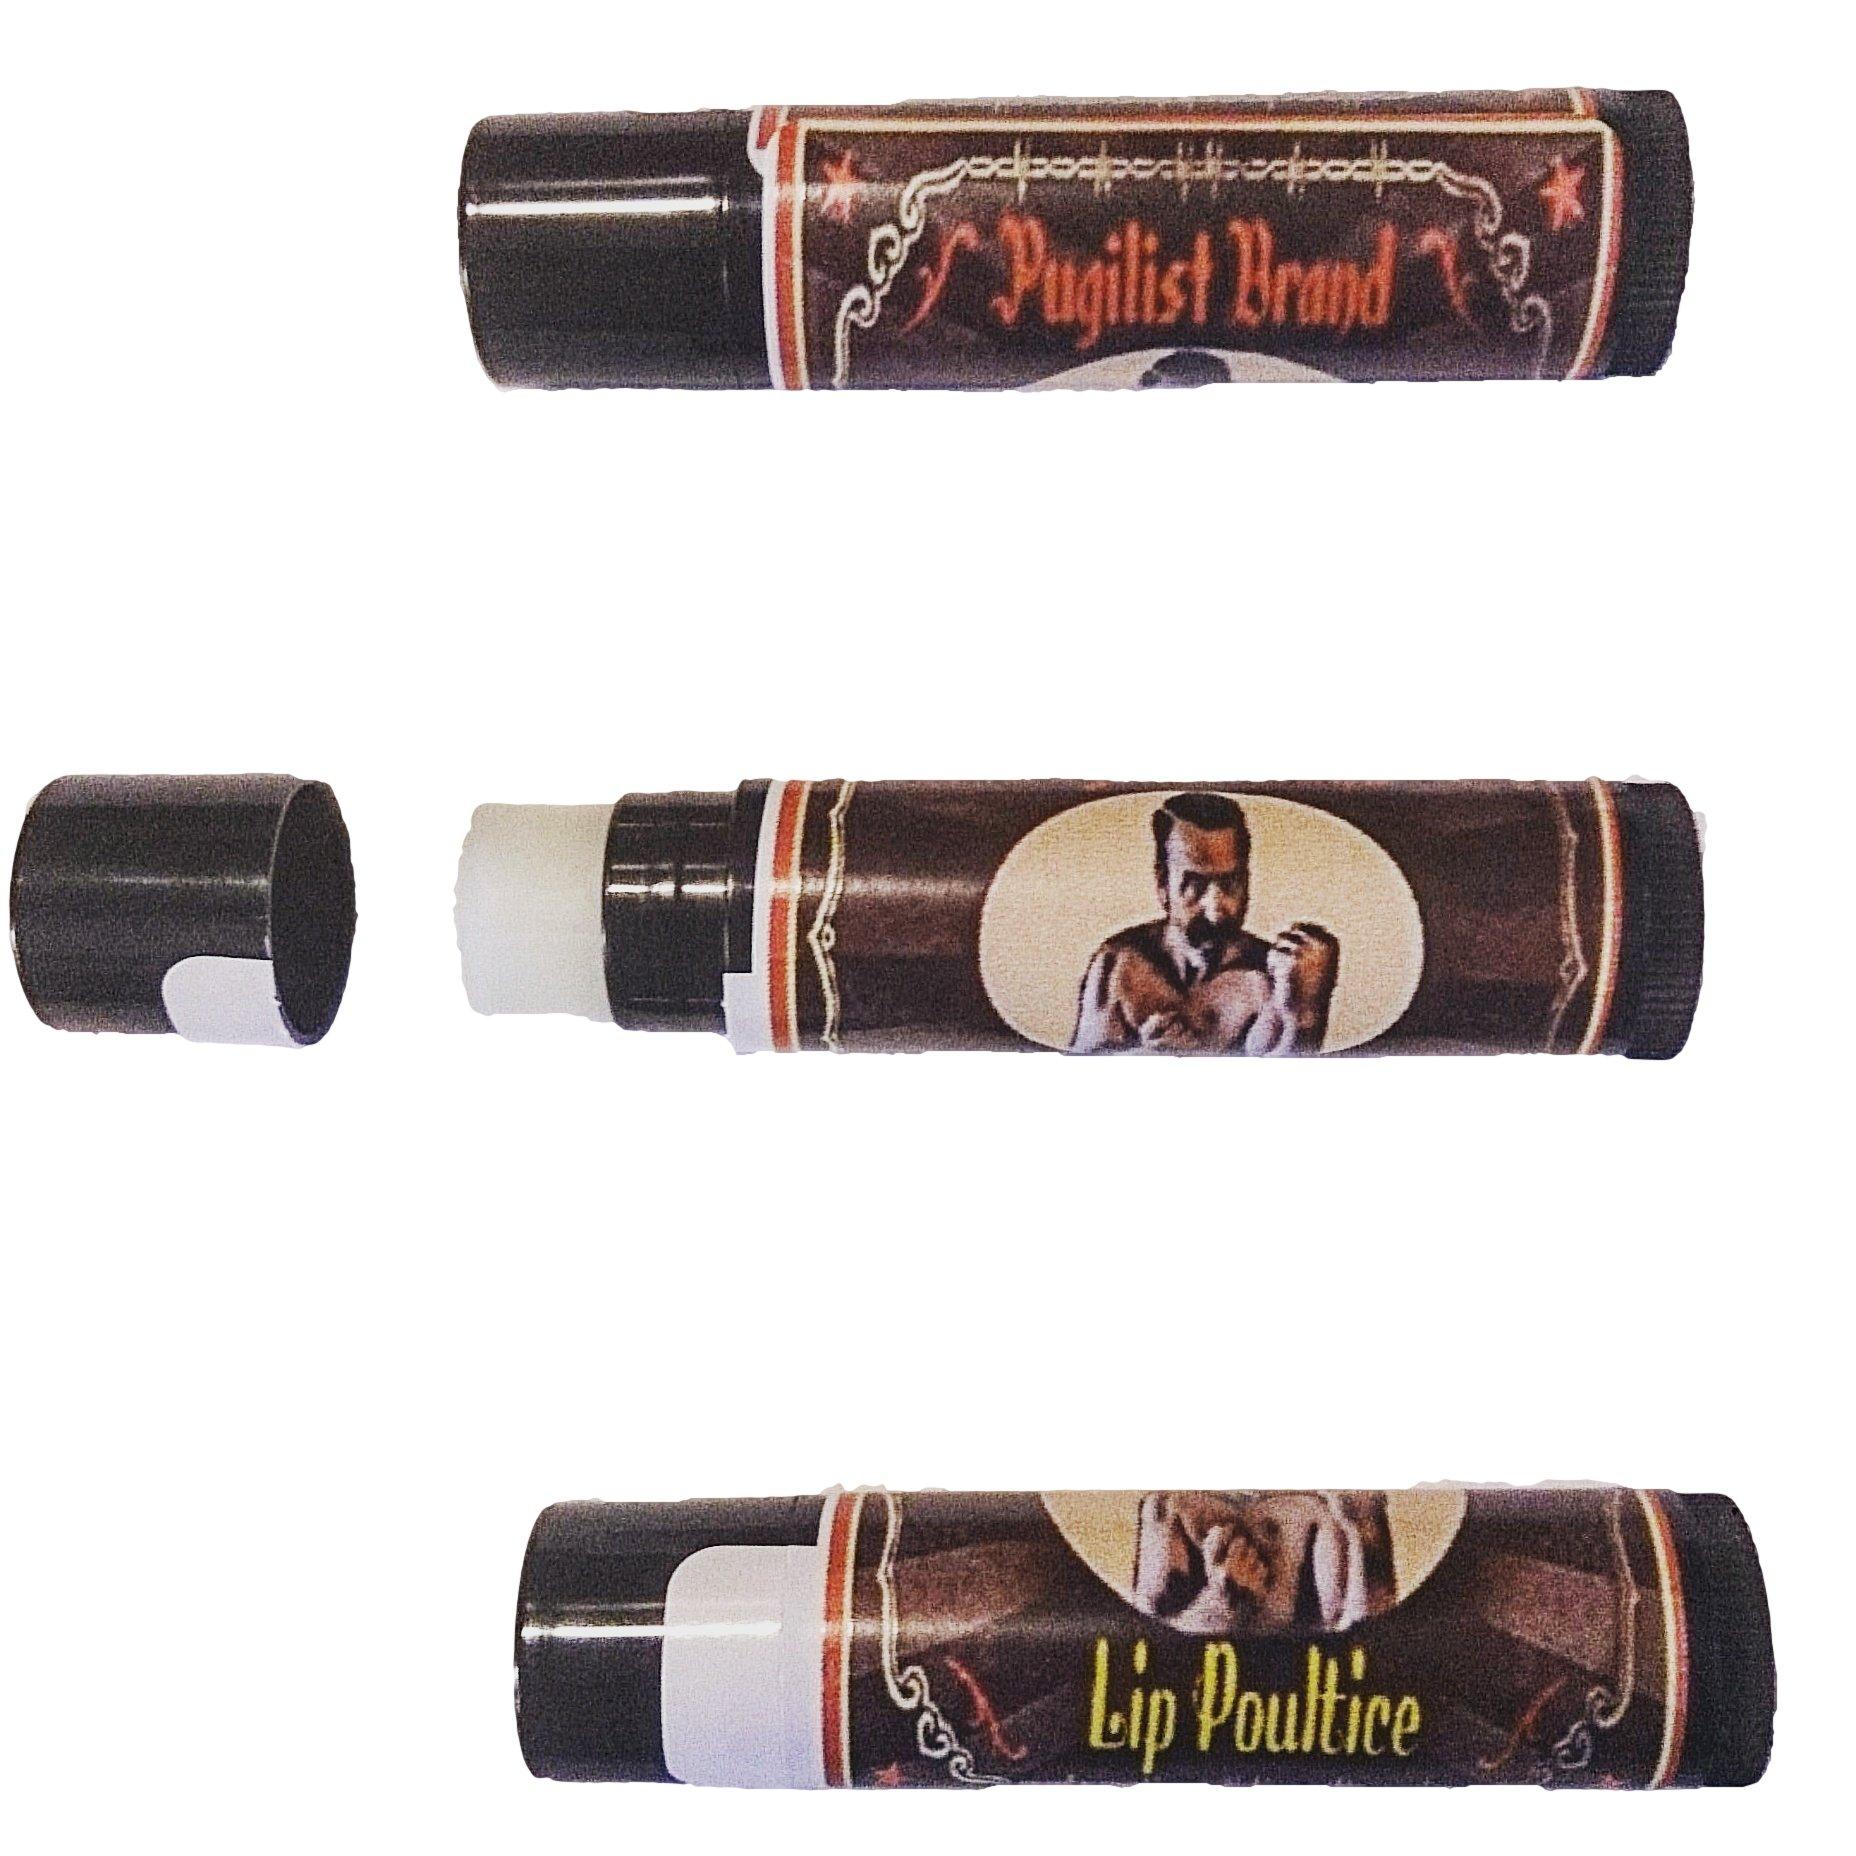 Beardsman's Heavy Bag: Beard Conditioning Kit (Cedar Atlas Shrugged)